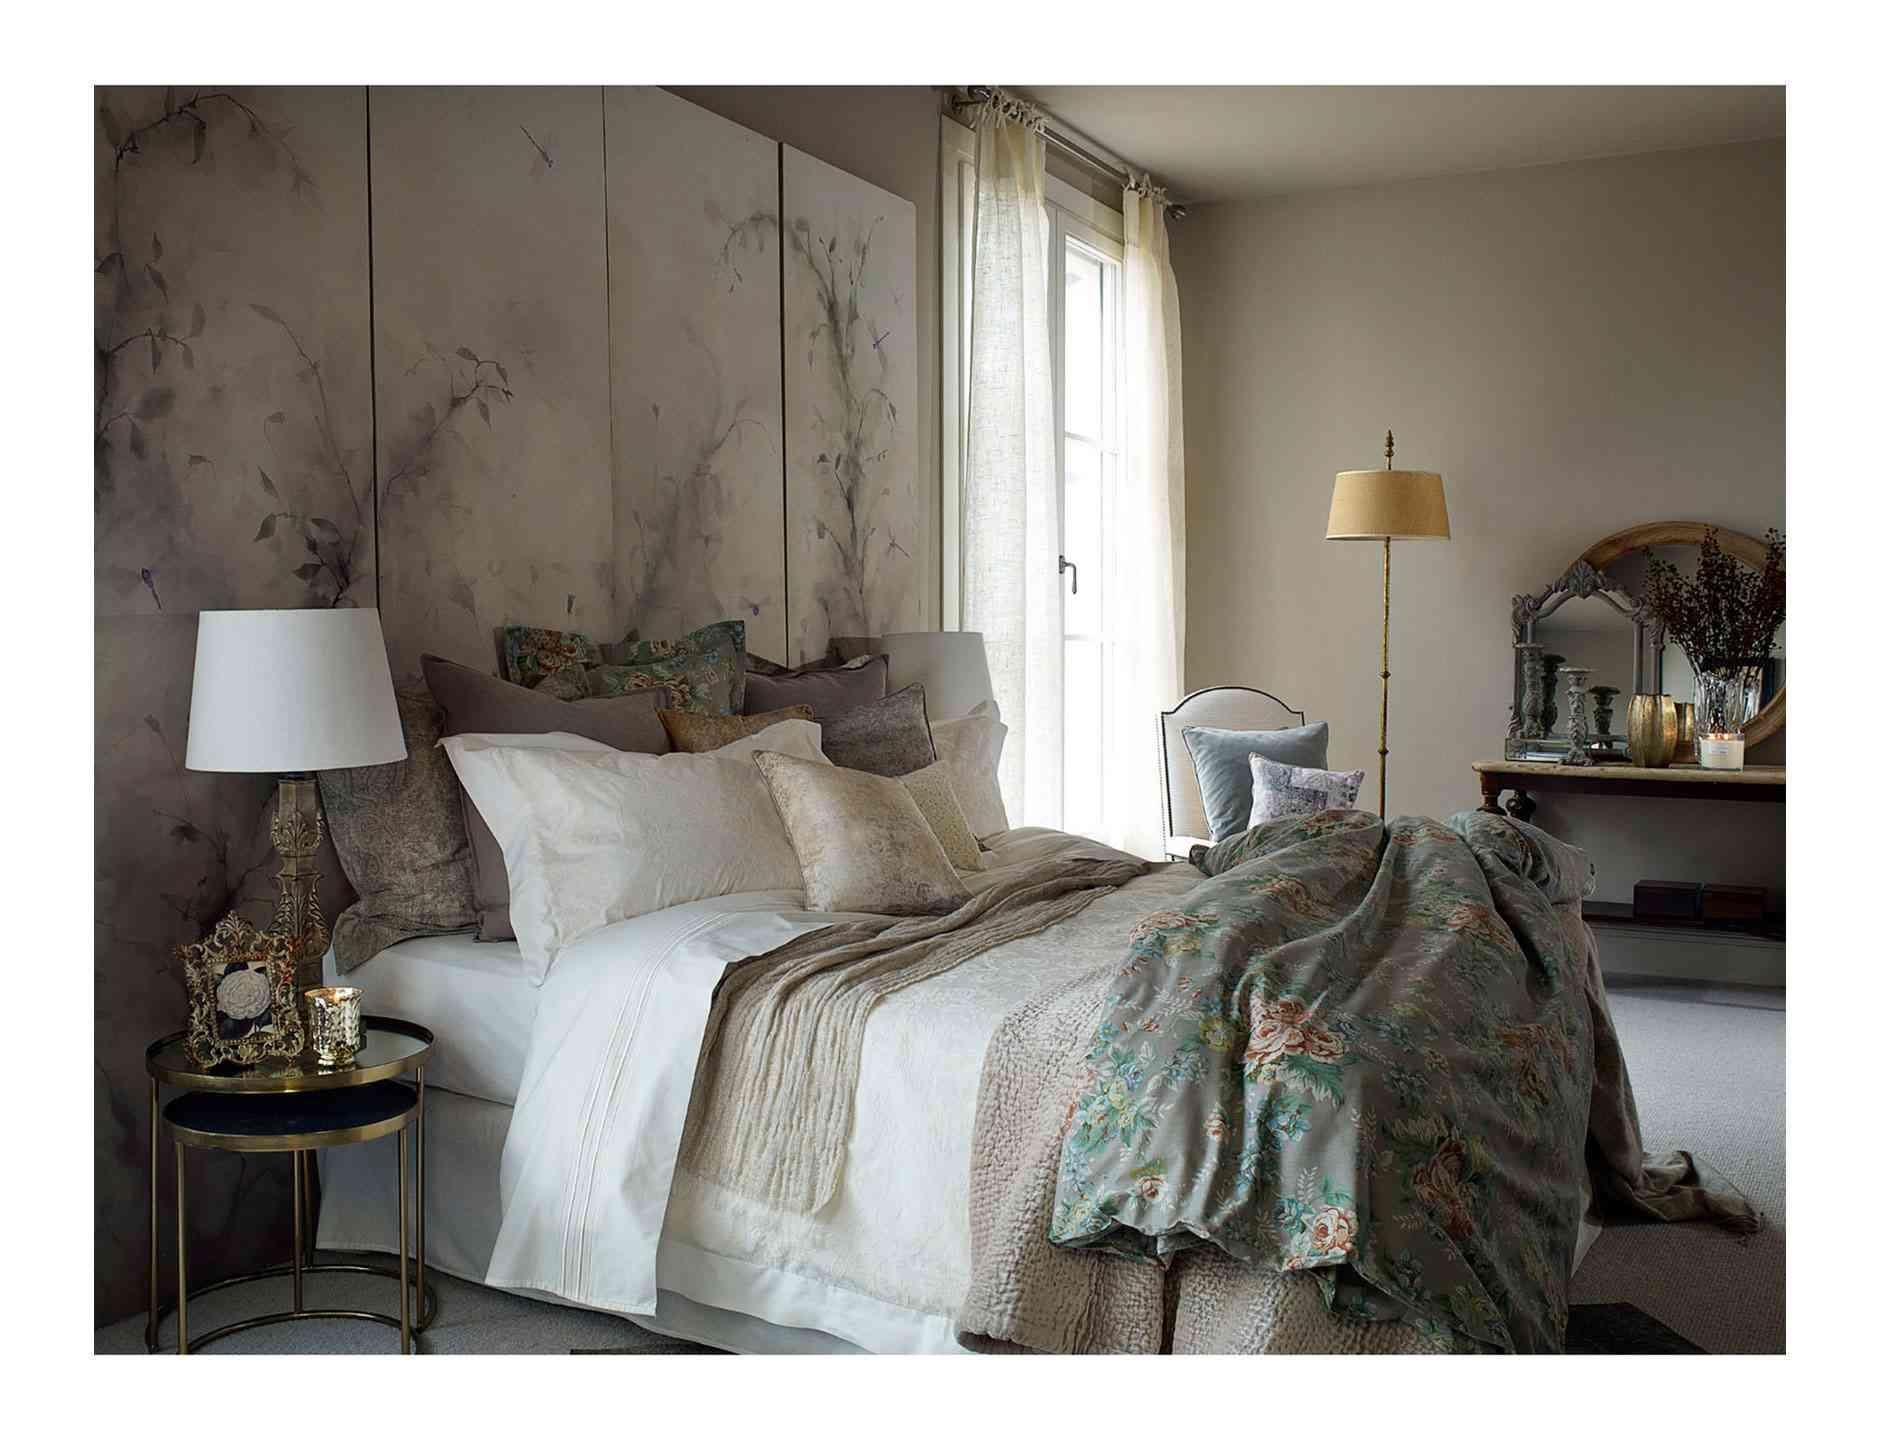 nueva colecci n zara home oto o invierno 2014 decoraci n de interiores opendeco. Black Bedroom Furniture Sets. Home Design Ideas